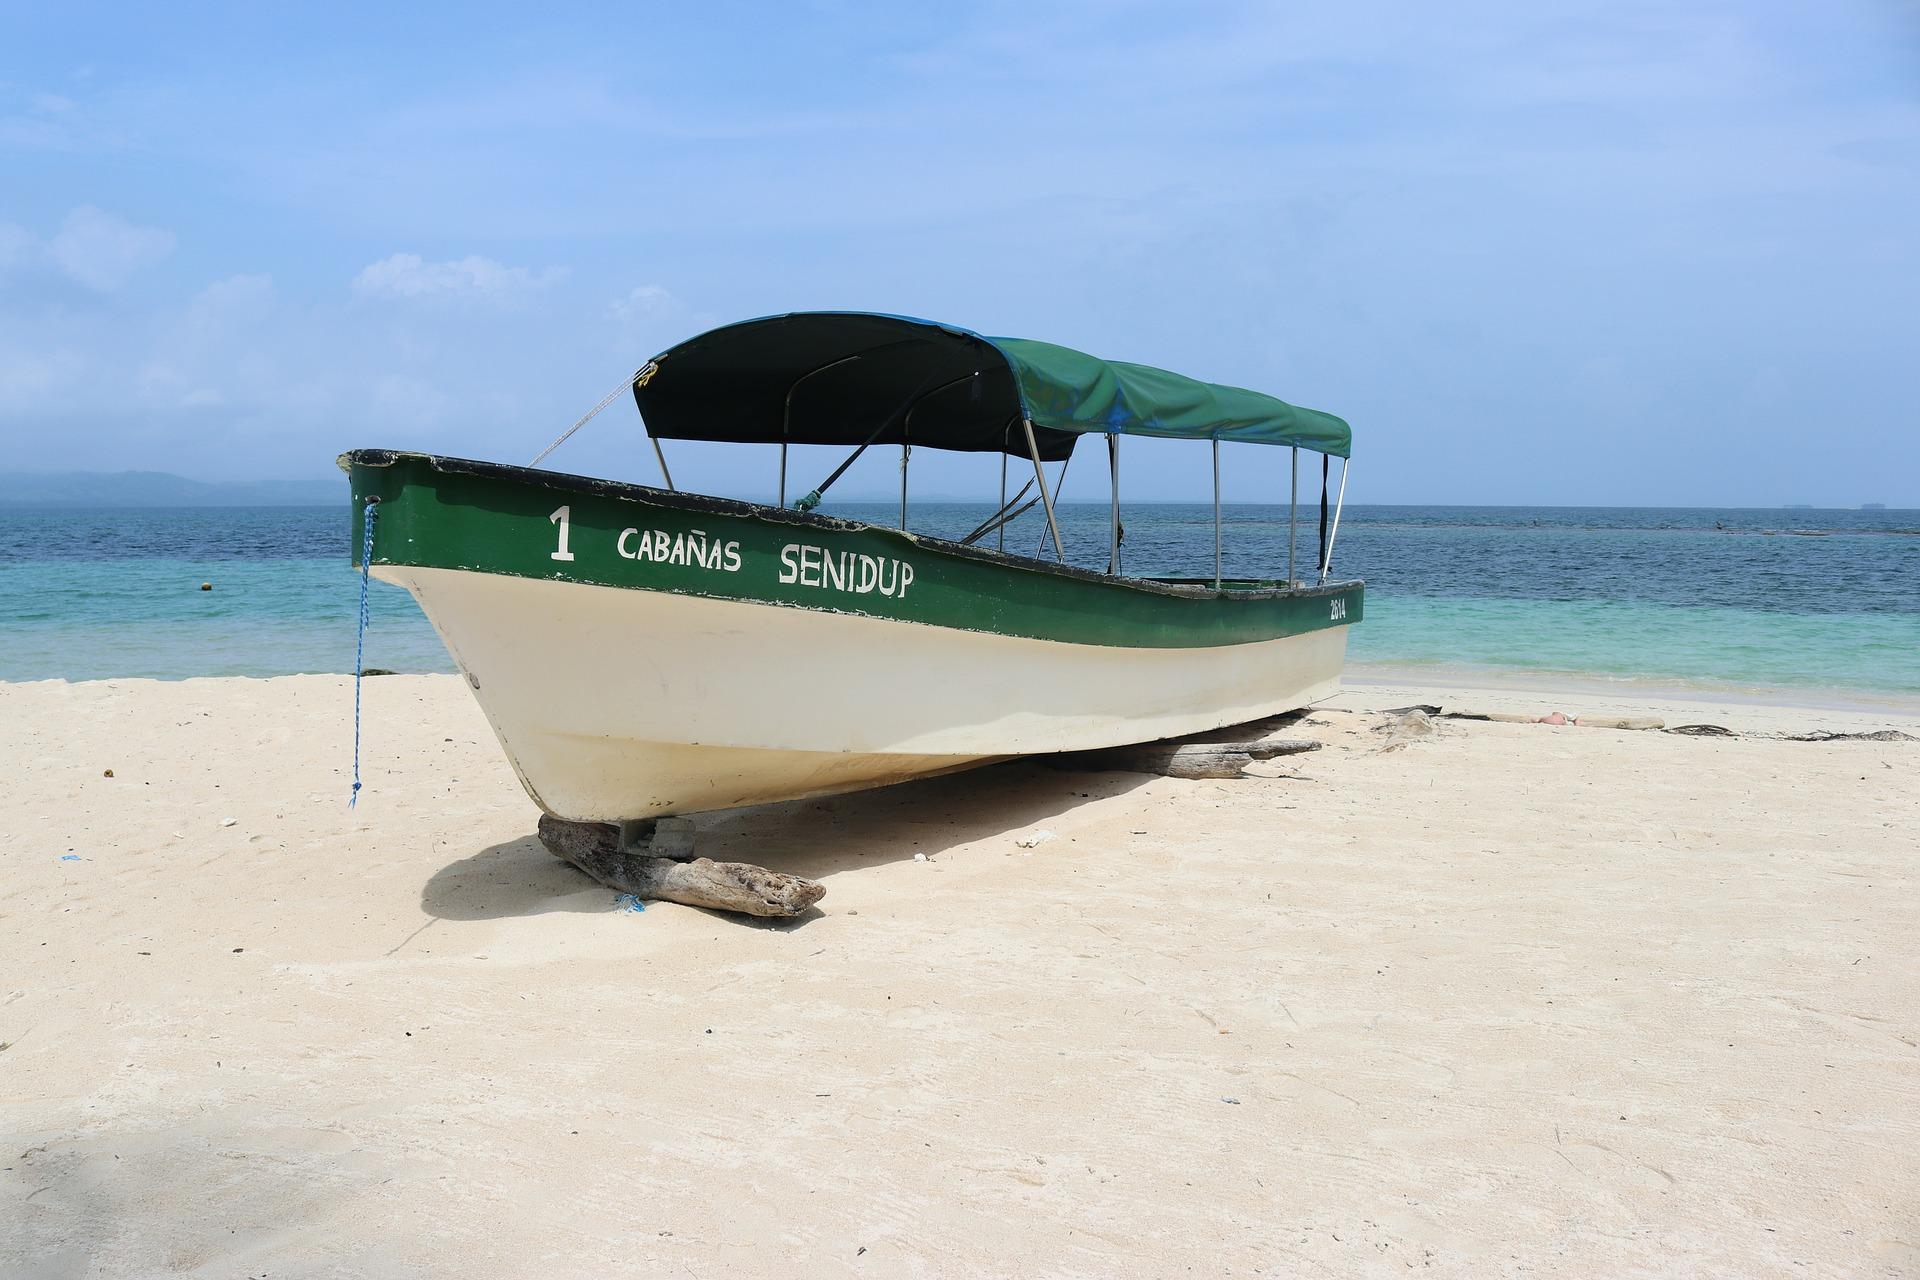 Panama City Urlaub günstig buchen